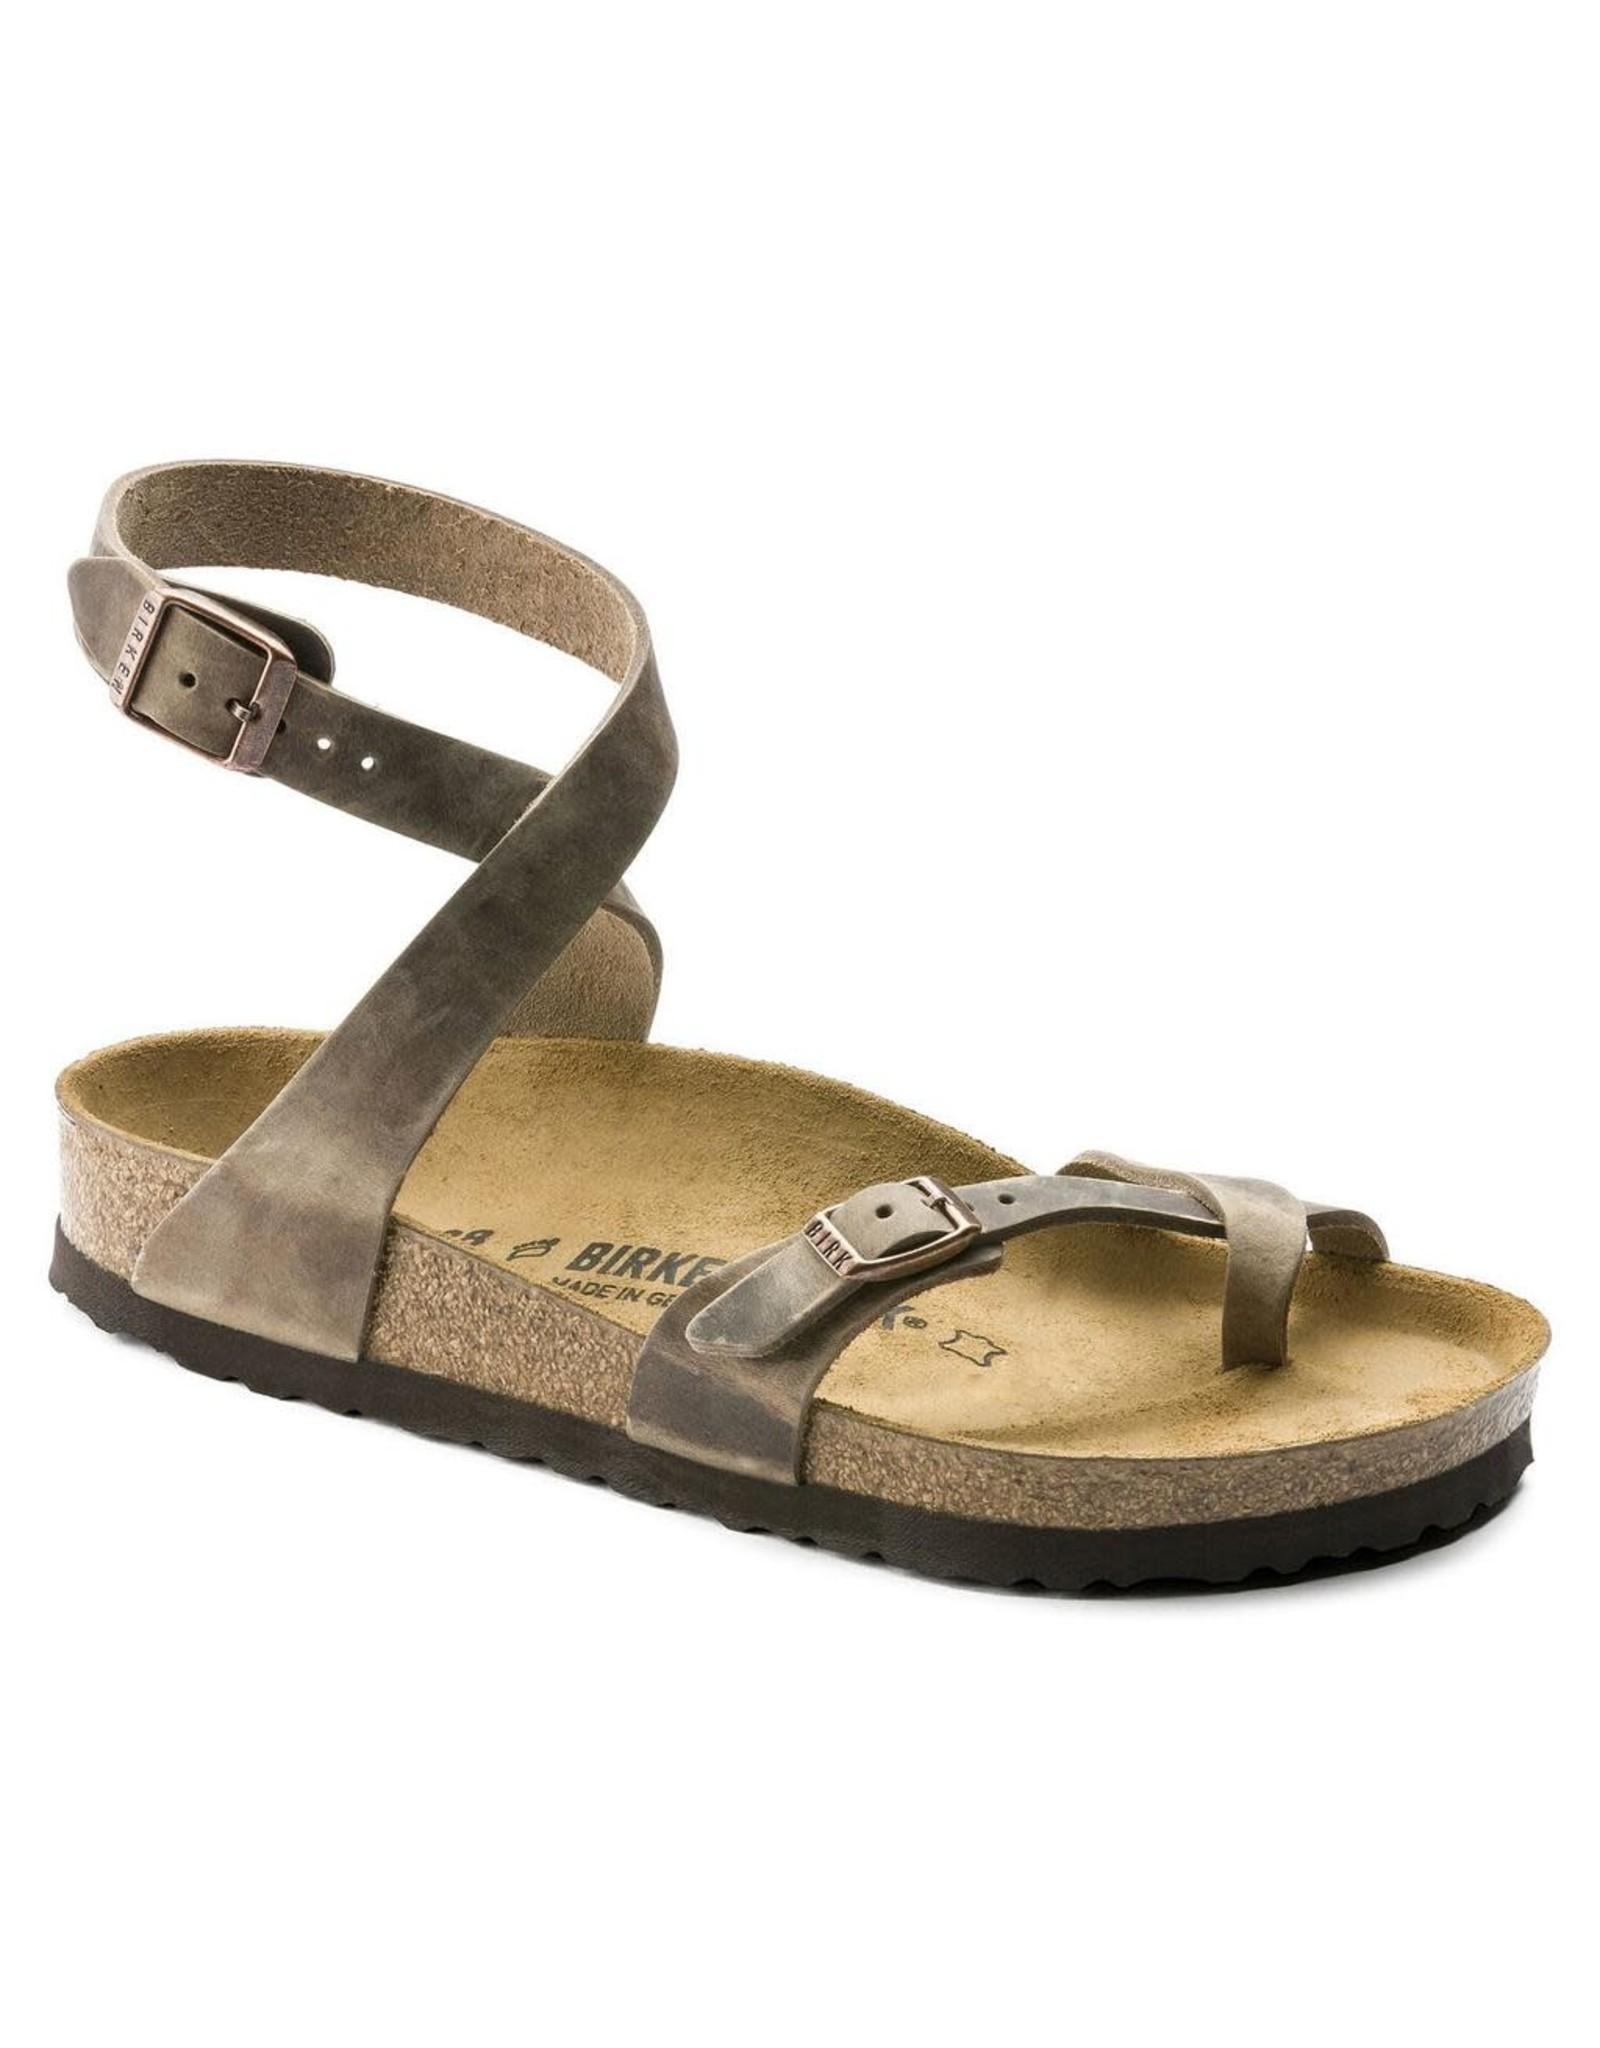 Birkenstock Yara Tobacco Leather Sandal